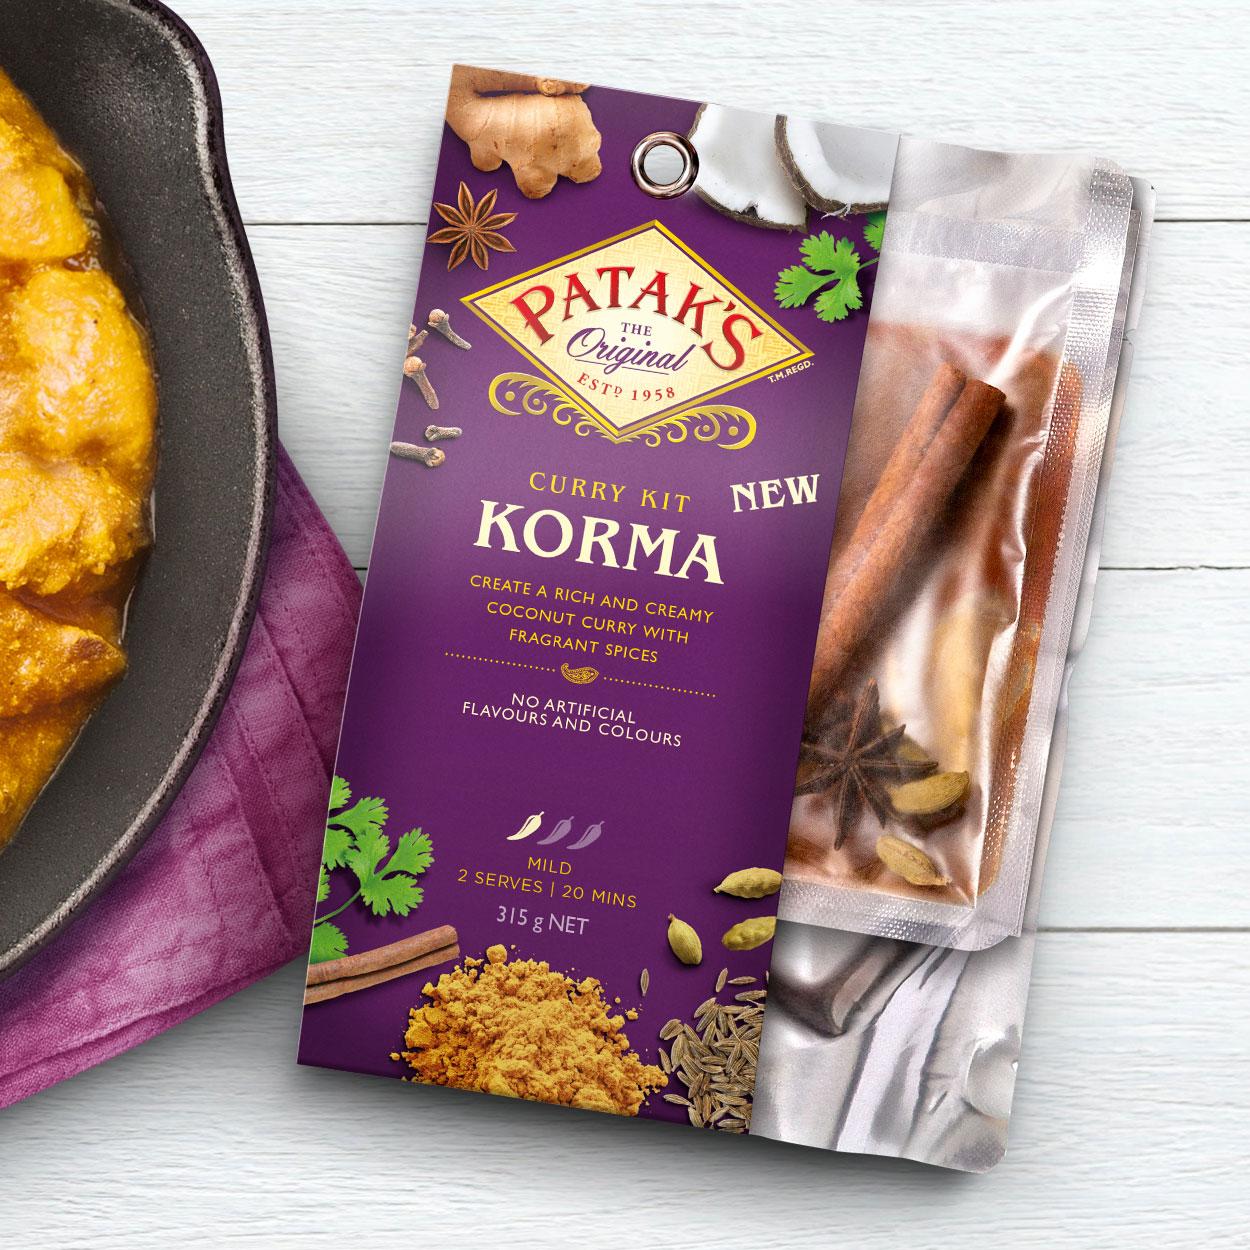 Pataks Curry Kit Meal Kit Davidson Branding We Grow FMCG Packaging